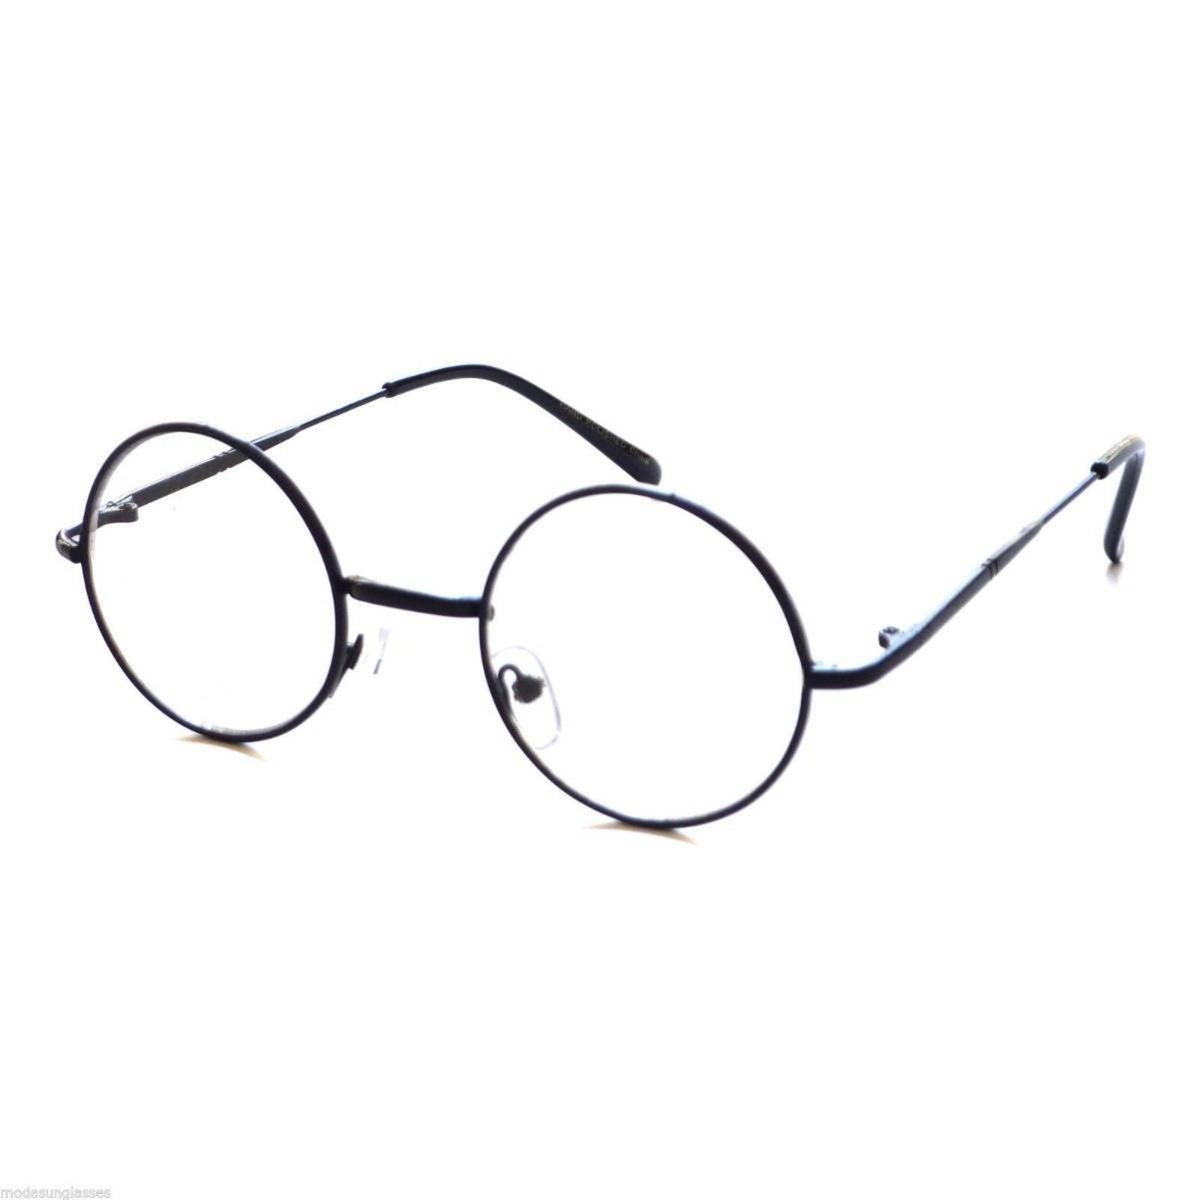 7e20fd4236370 Óculos Redondo - Harry Potter - John Lennon   Óculos Feminino Nunca ...